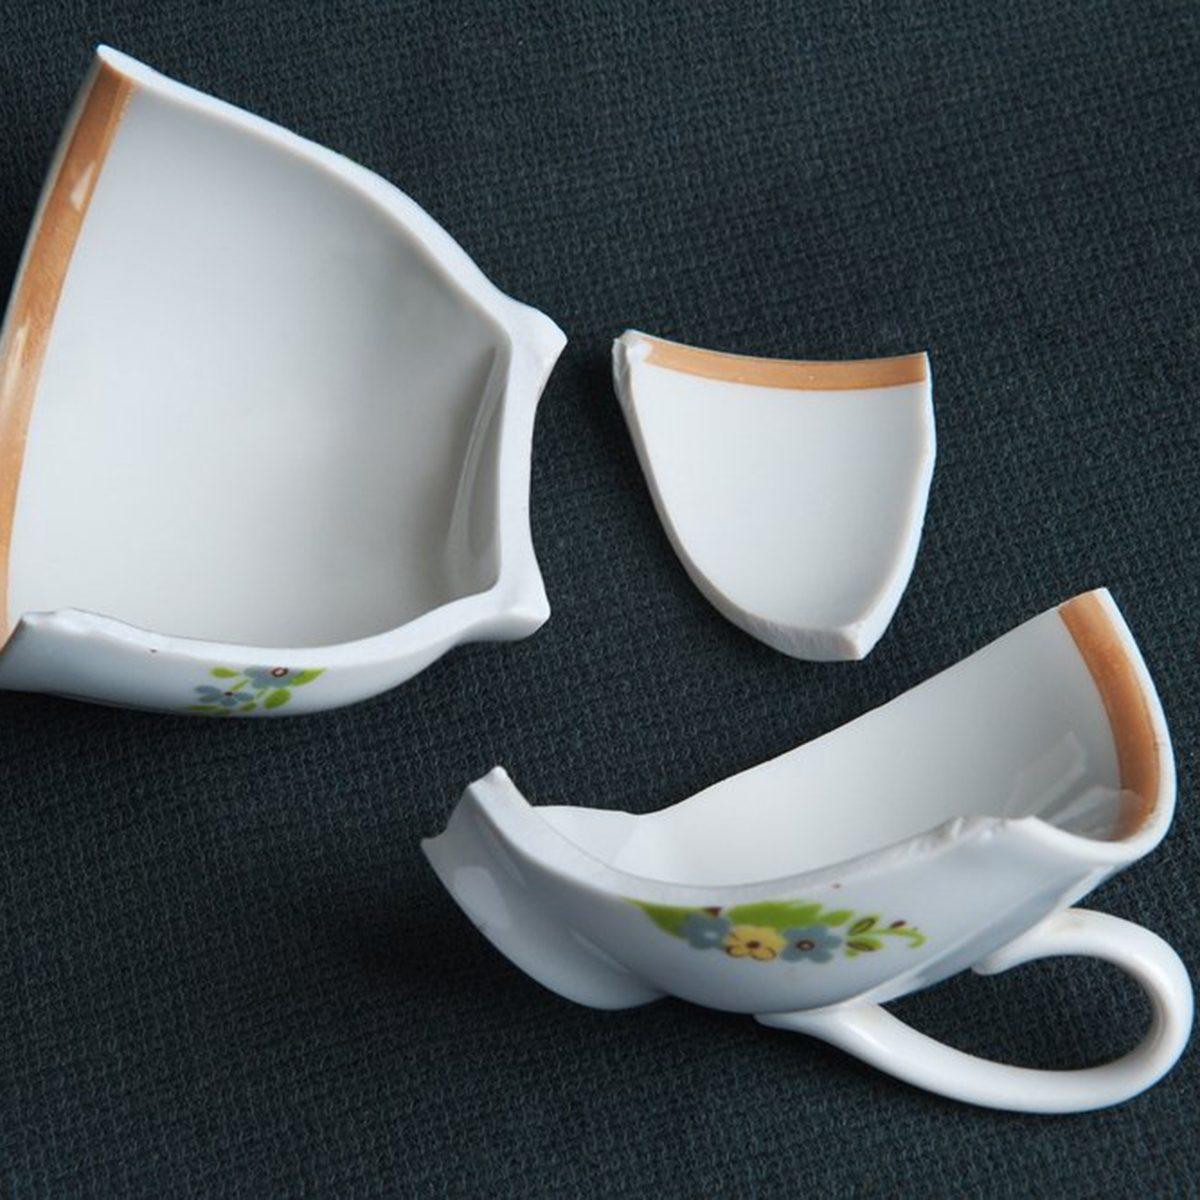 Broken ceramic cup